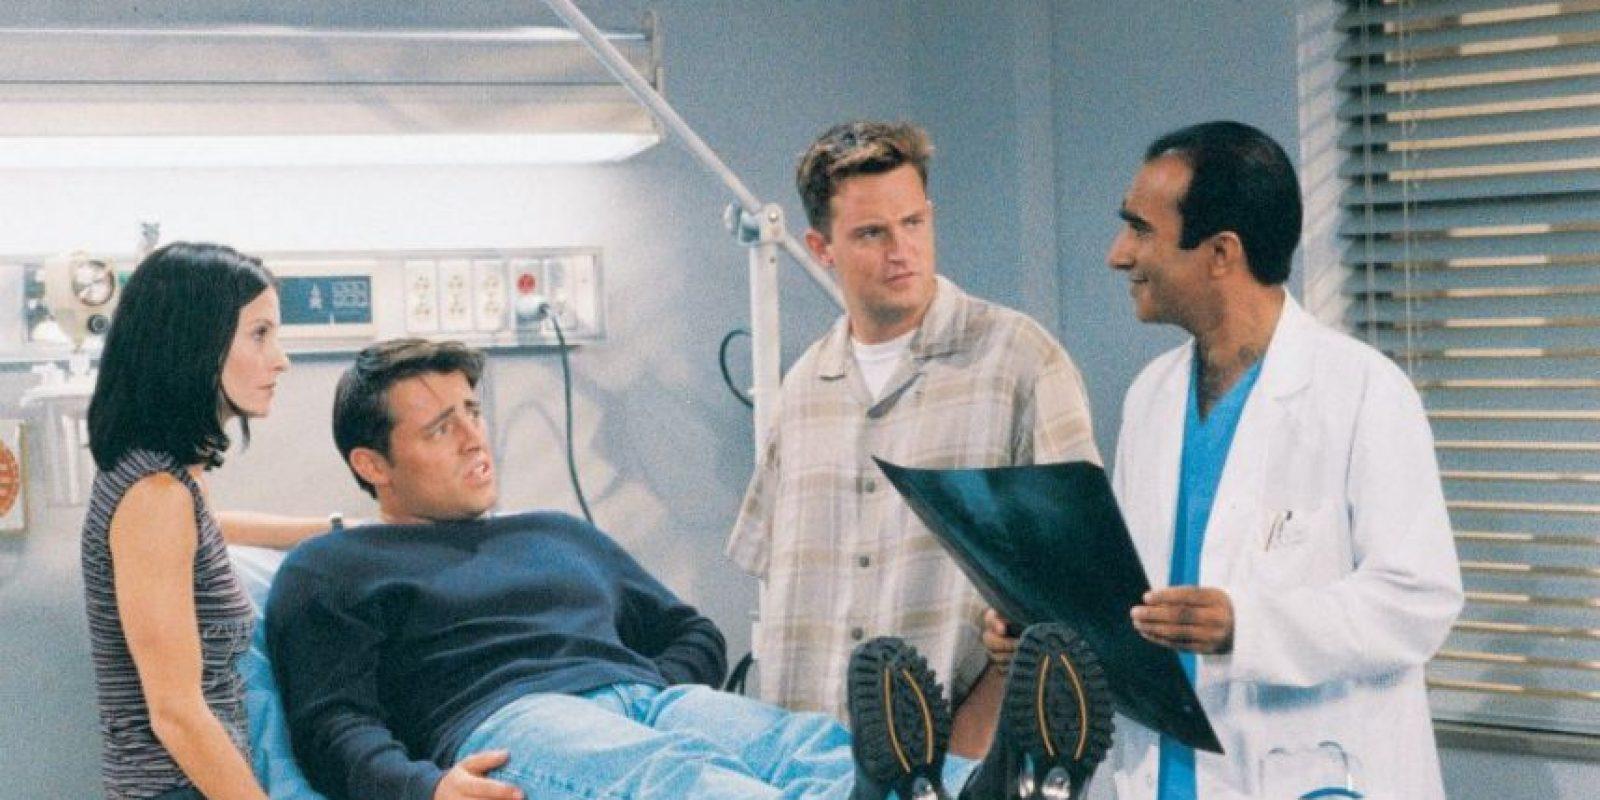 La serie recibió a diversas celebridades como: Brad Pitt, Danny De Vito, Julia Roberts, George Clooney, Ralph Lauren, Charlie Sheen, Sean Penn y Robin Williams Foto:vía facebook.com/friends.tv